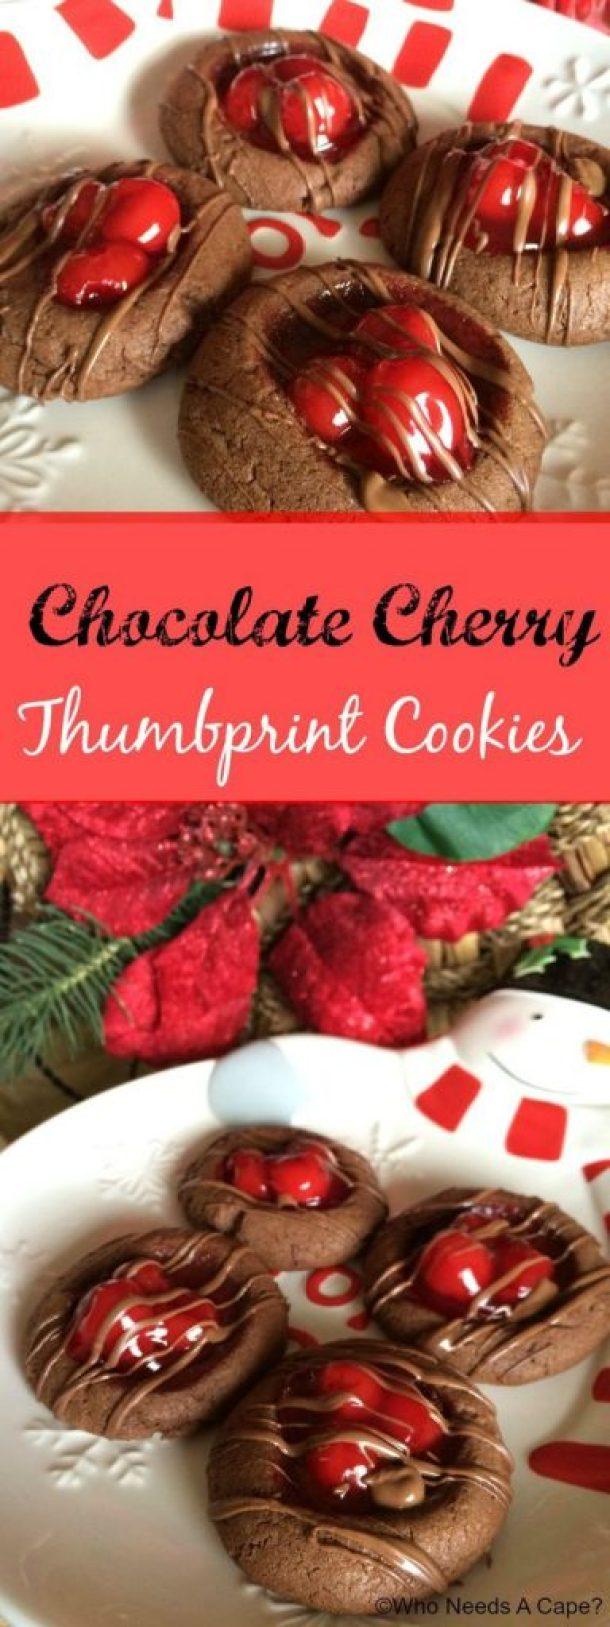 Chocolate Cherry Thumbprint Cookies Recipe | Who Needs a Cape?